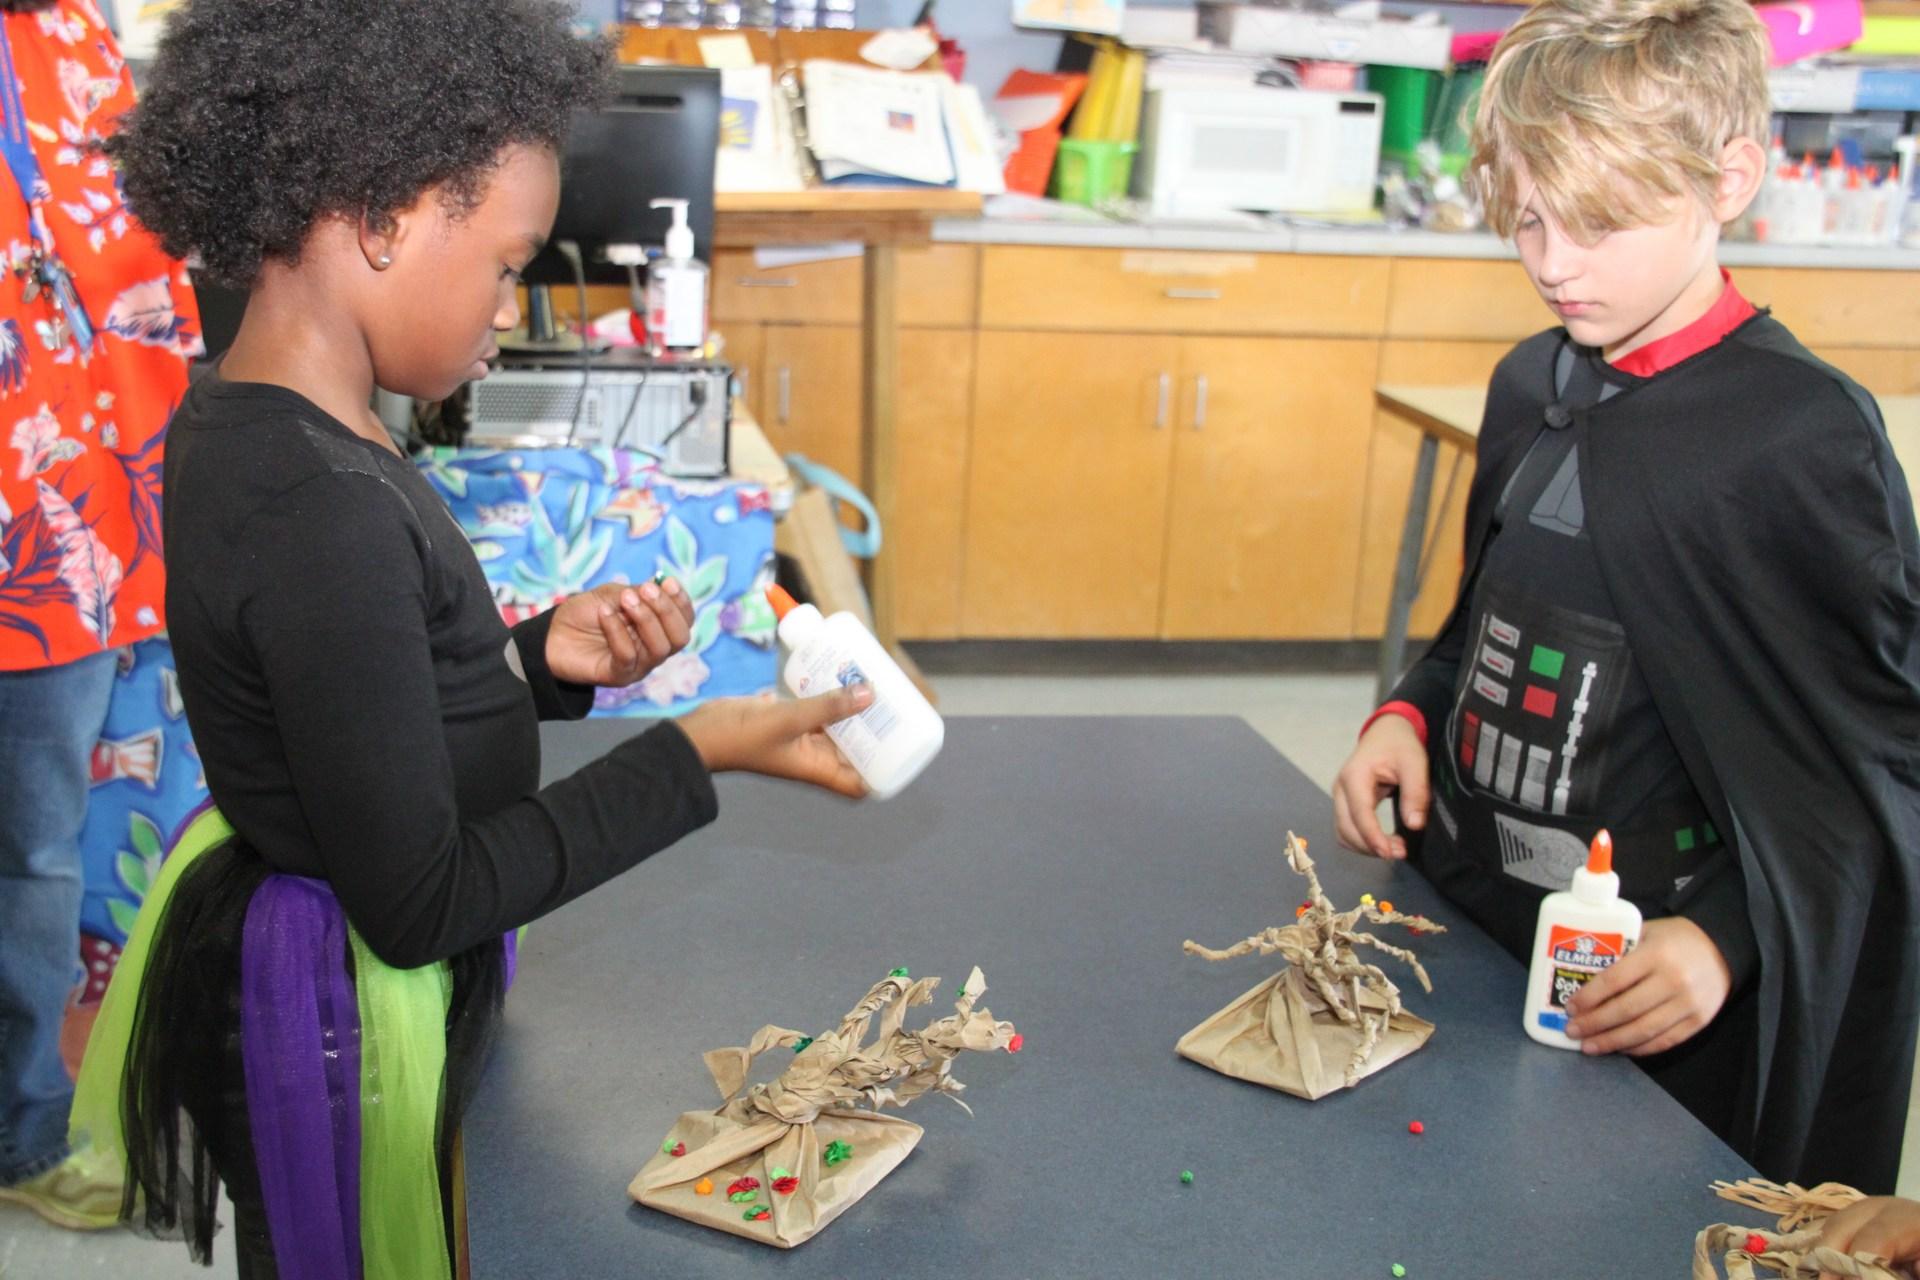 Students Preparing a Craft